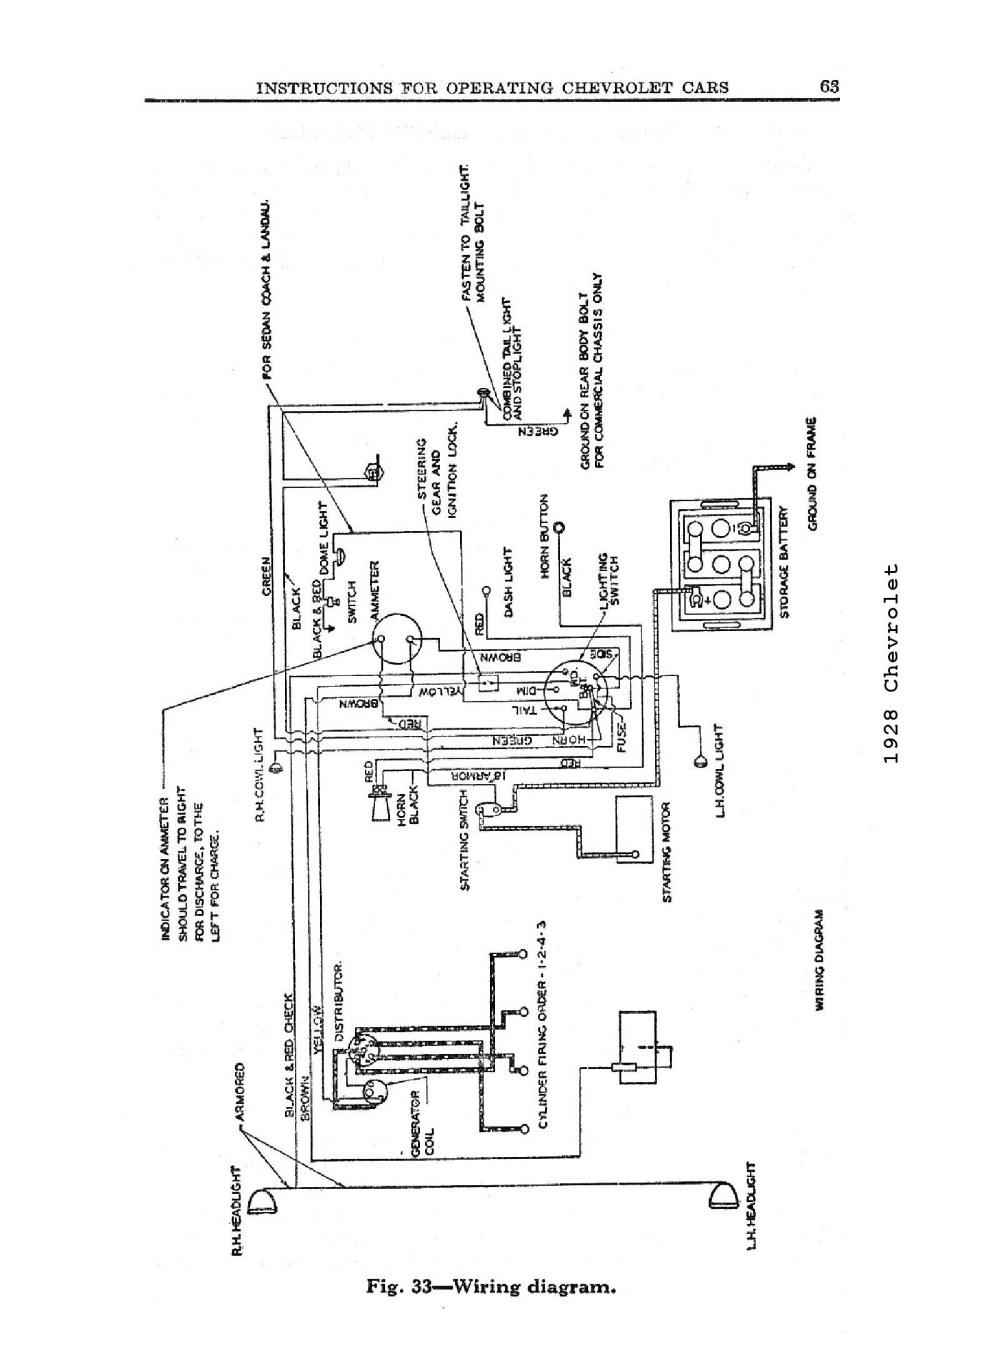 medium resolution of 85 chevy truck wiring diagram chevy wiring diagrams of 85 chevy truck wiring diagram 1960 chevrolet